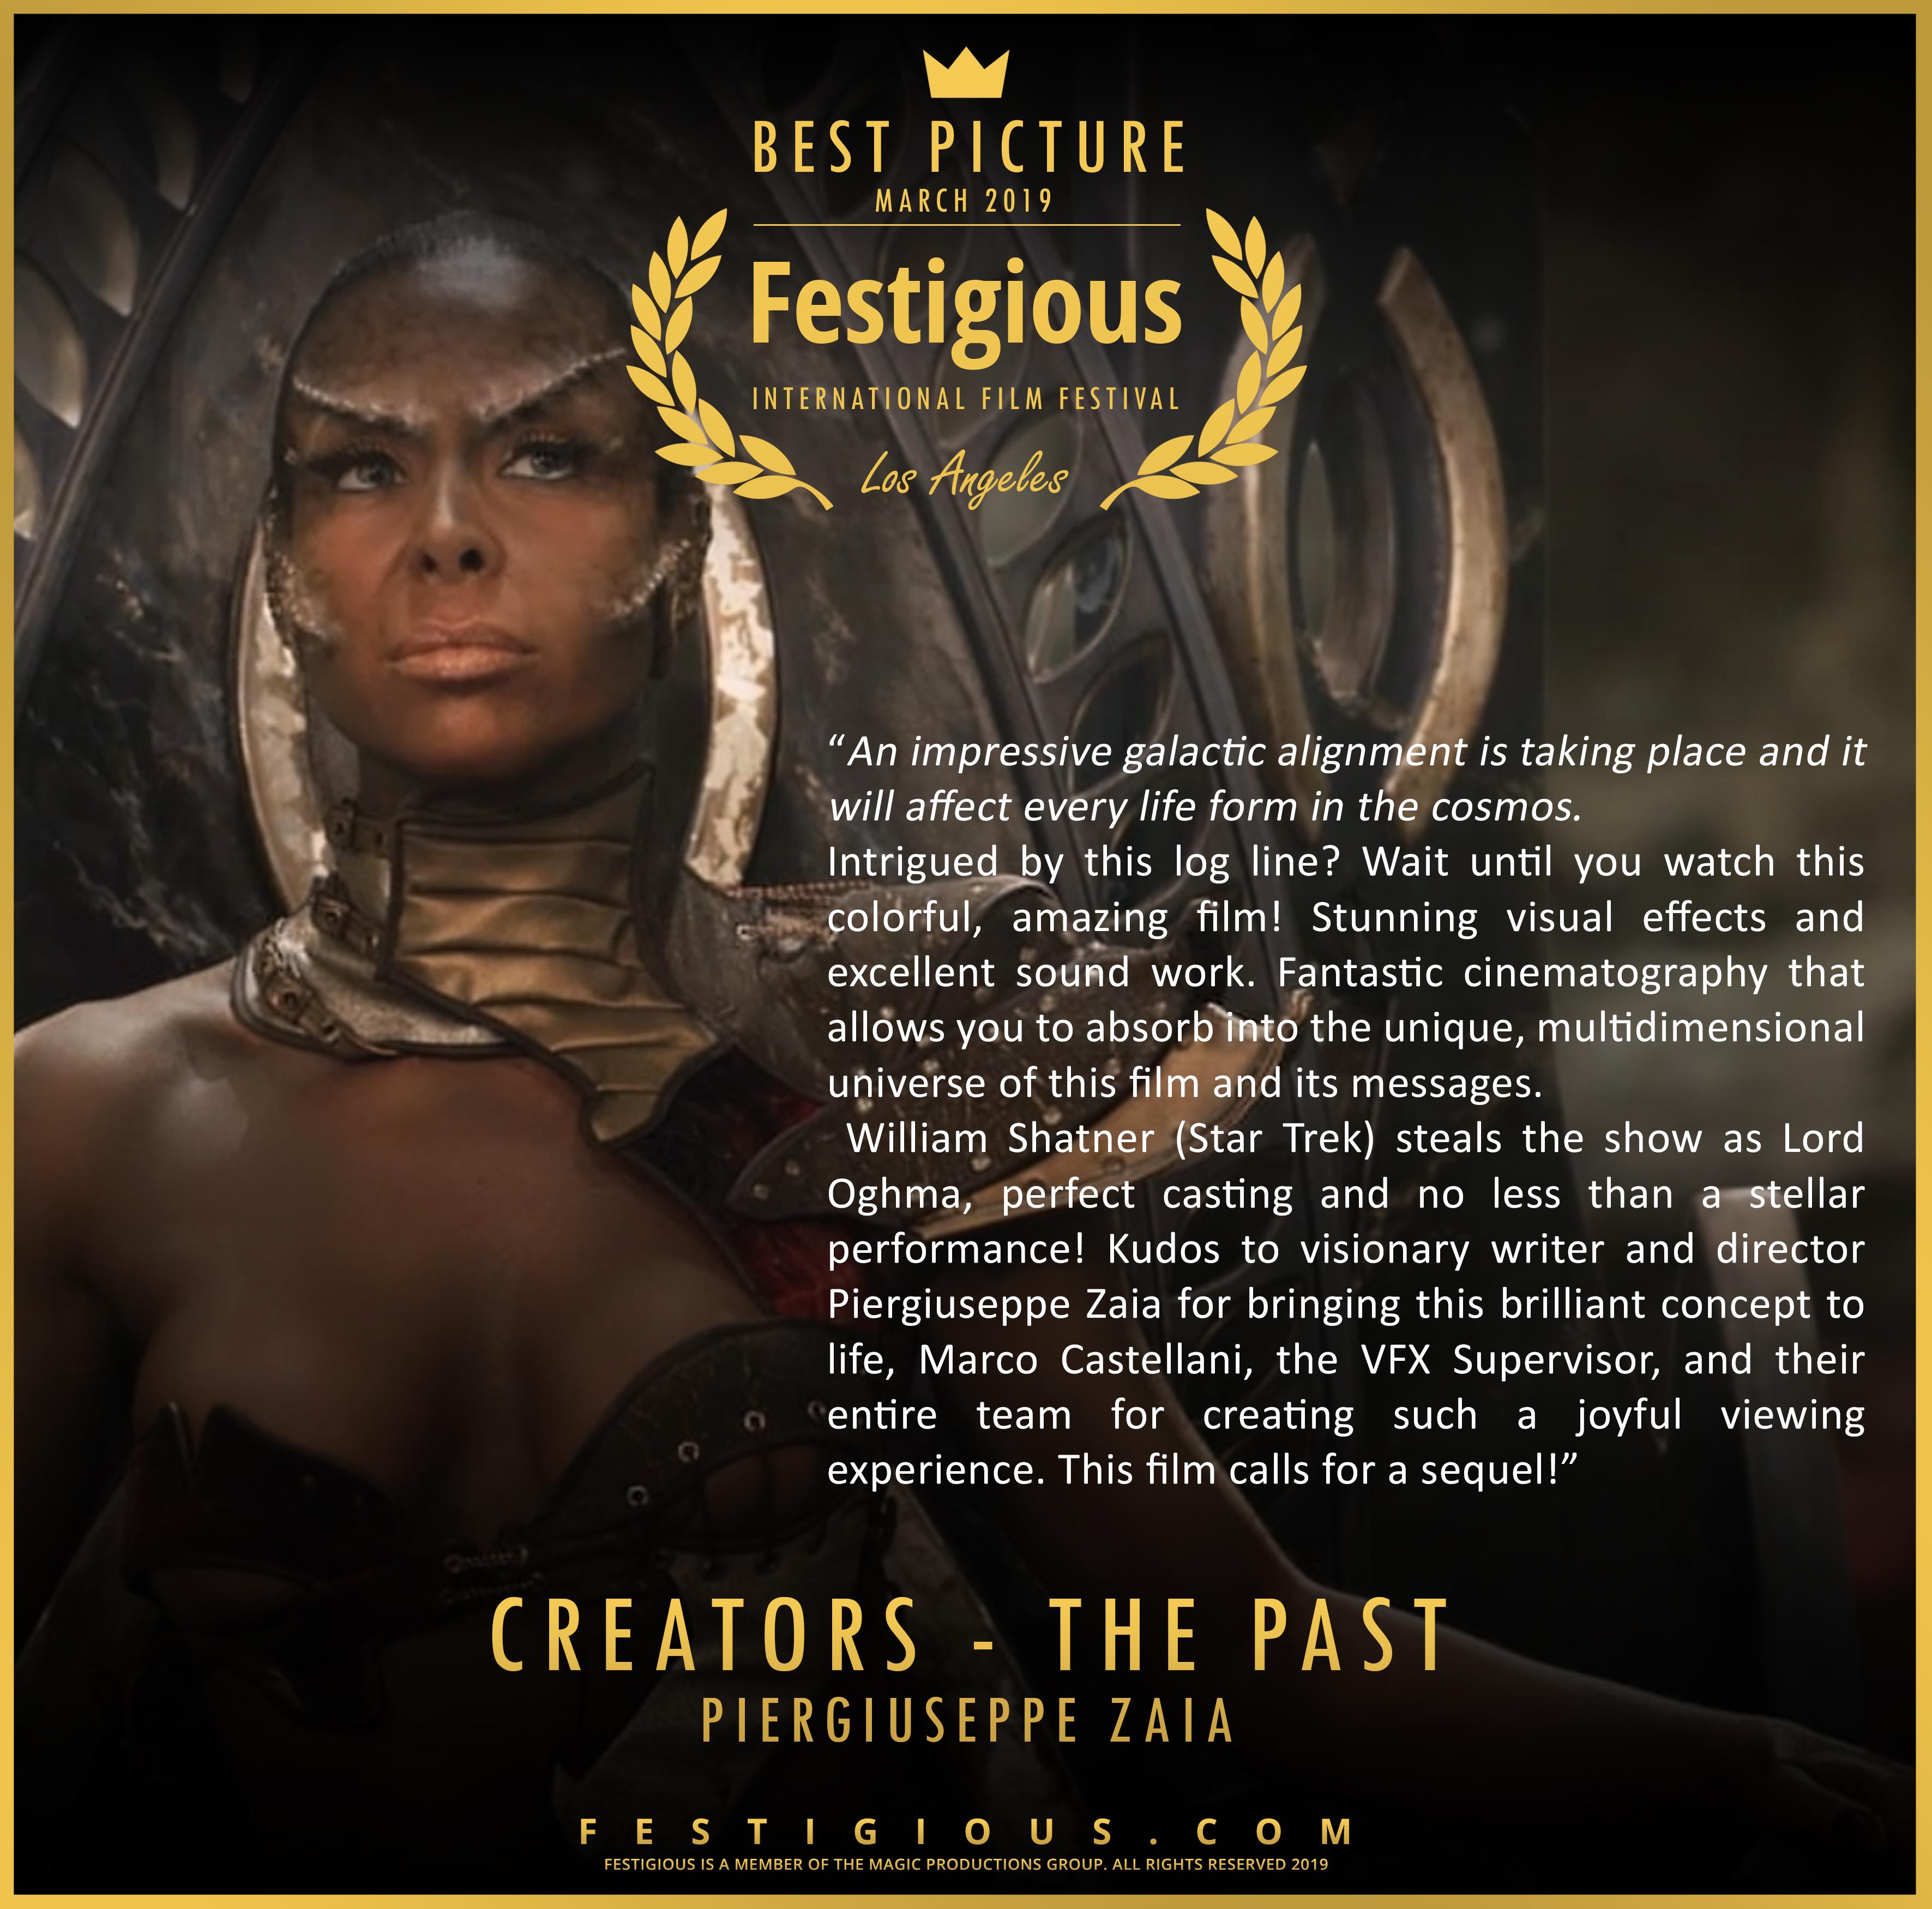 Creators - The Past design